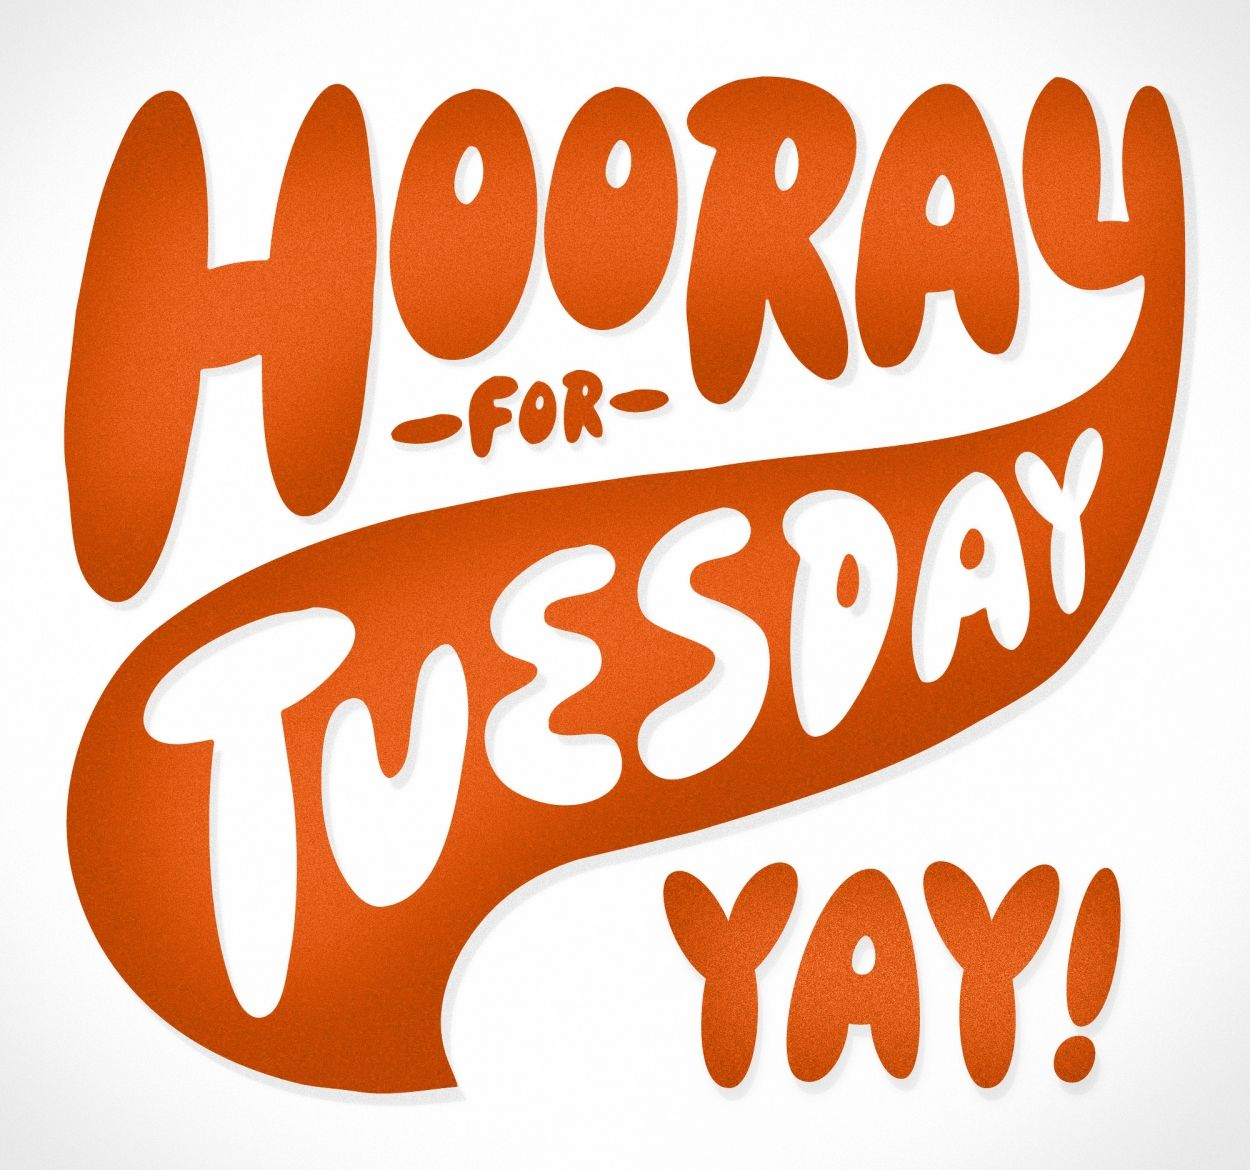 Hooray For Tuesday